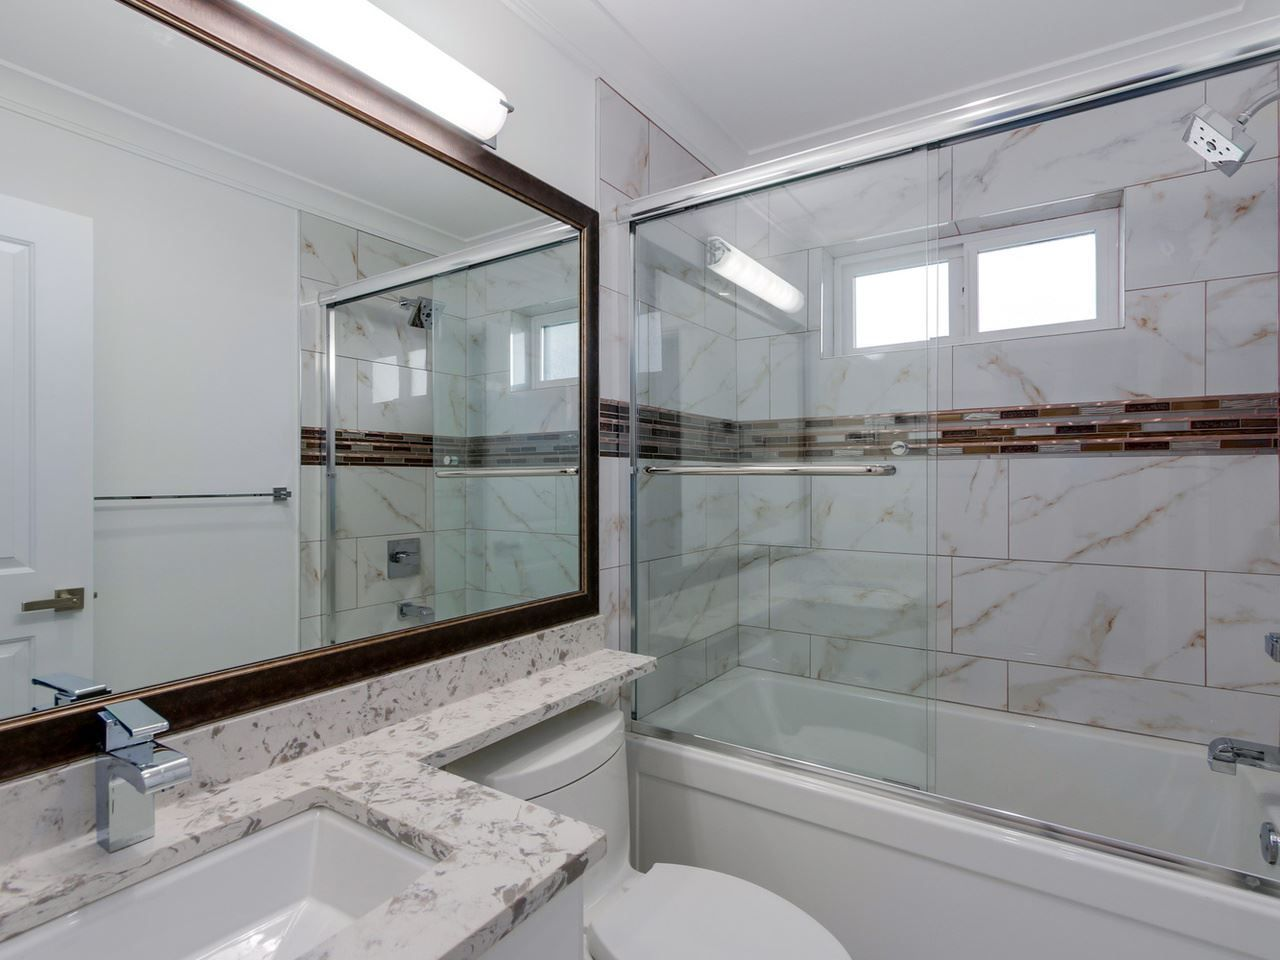 Photo 17: Photos: 1560 MAPLE Street: White Rock House for sale (South Surrey White Rock)  : MLS®# R2138926